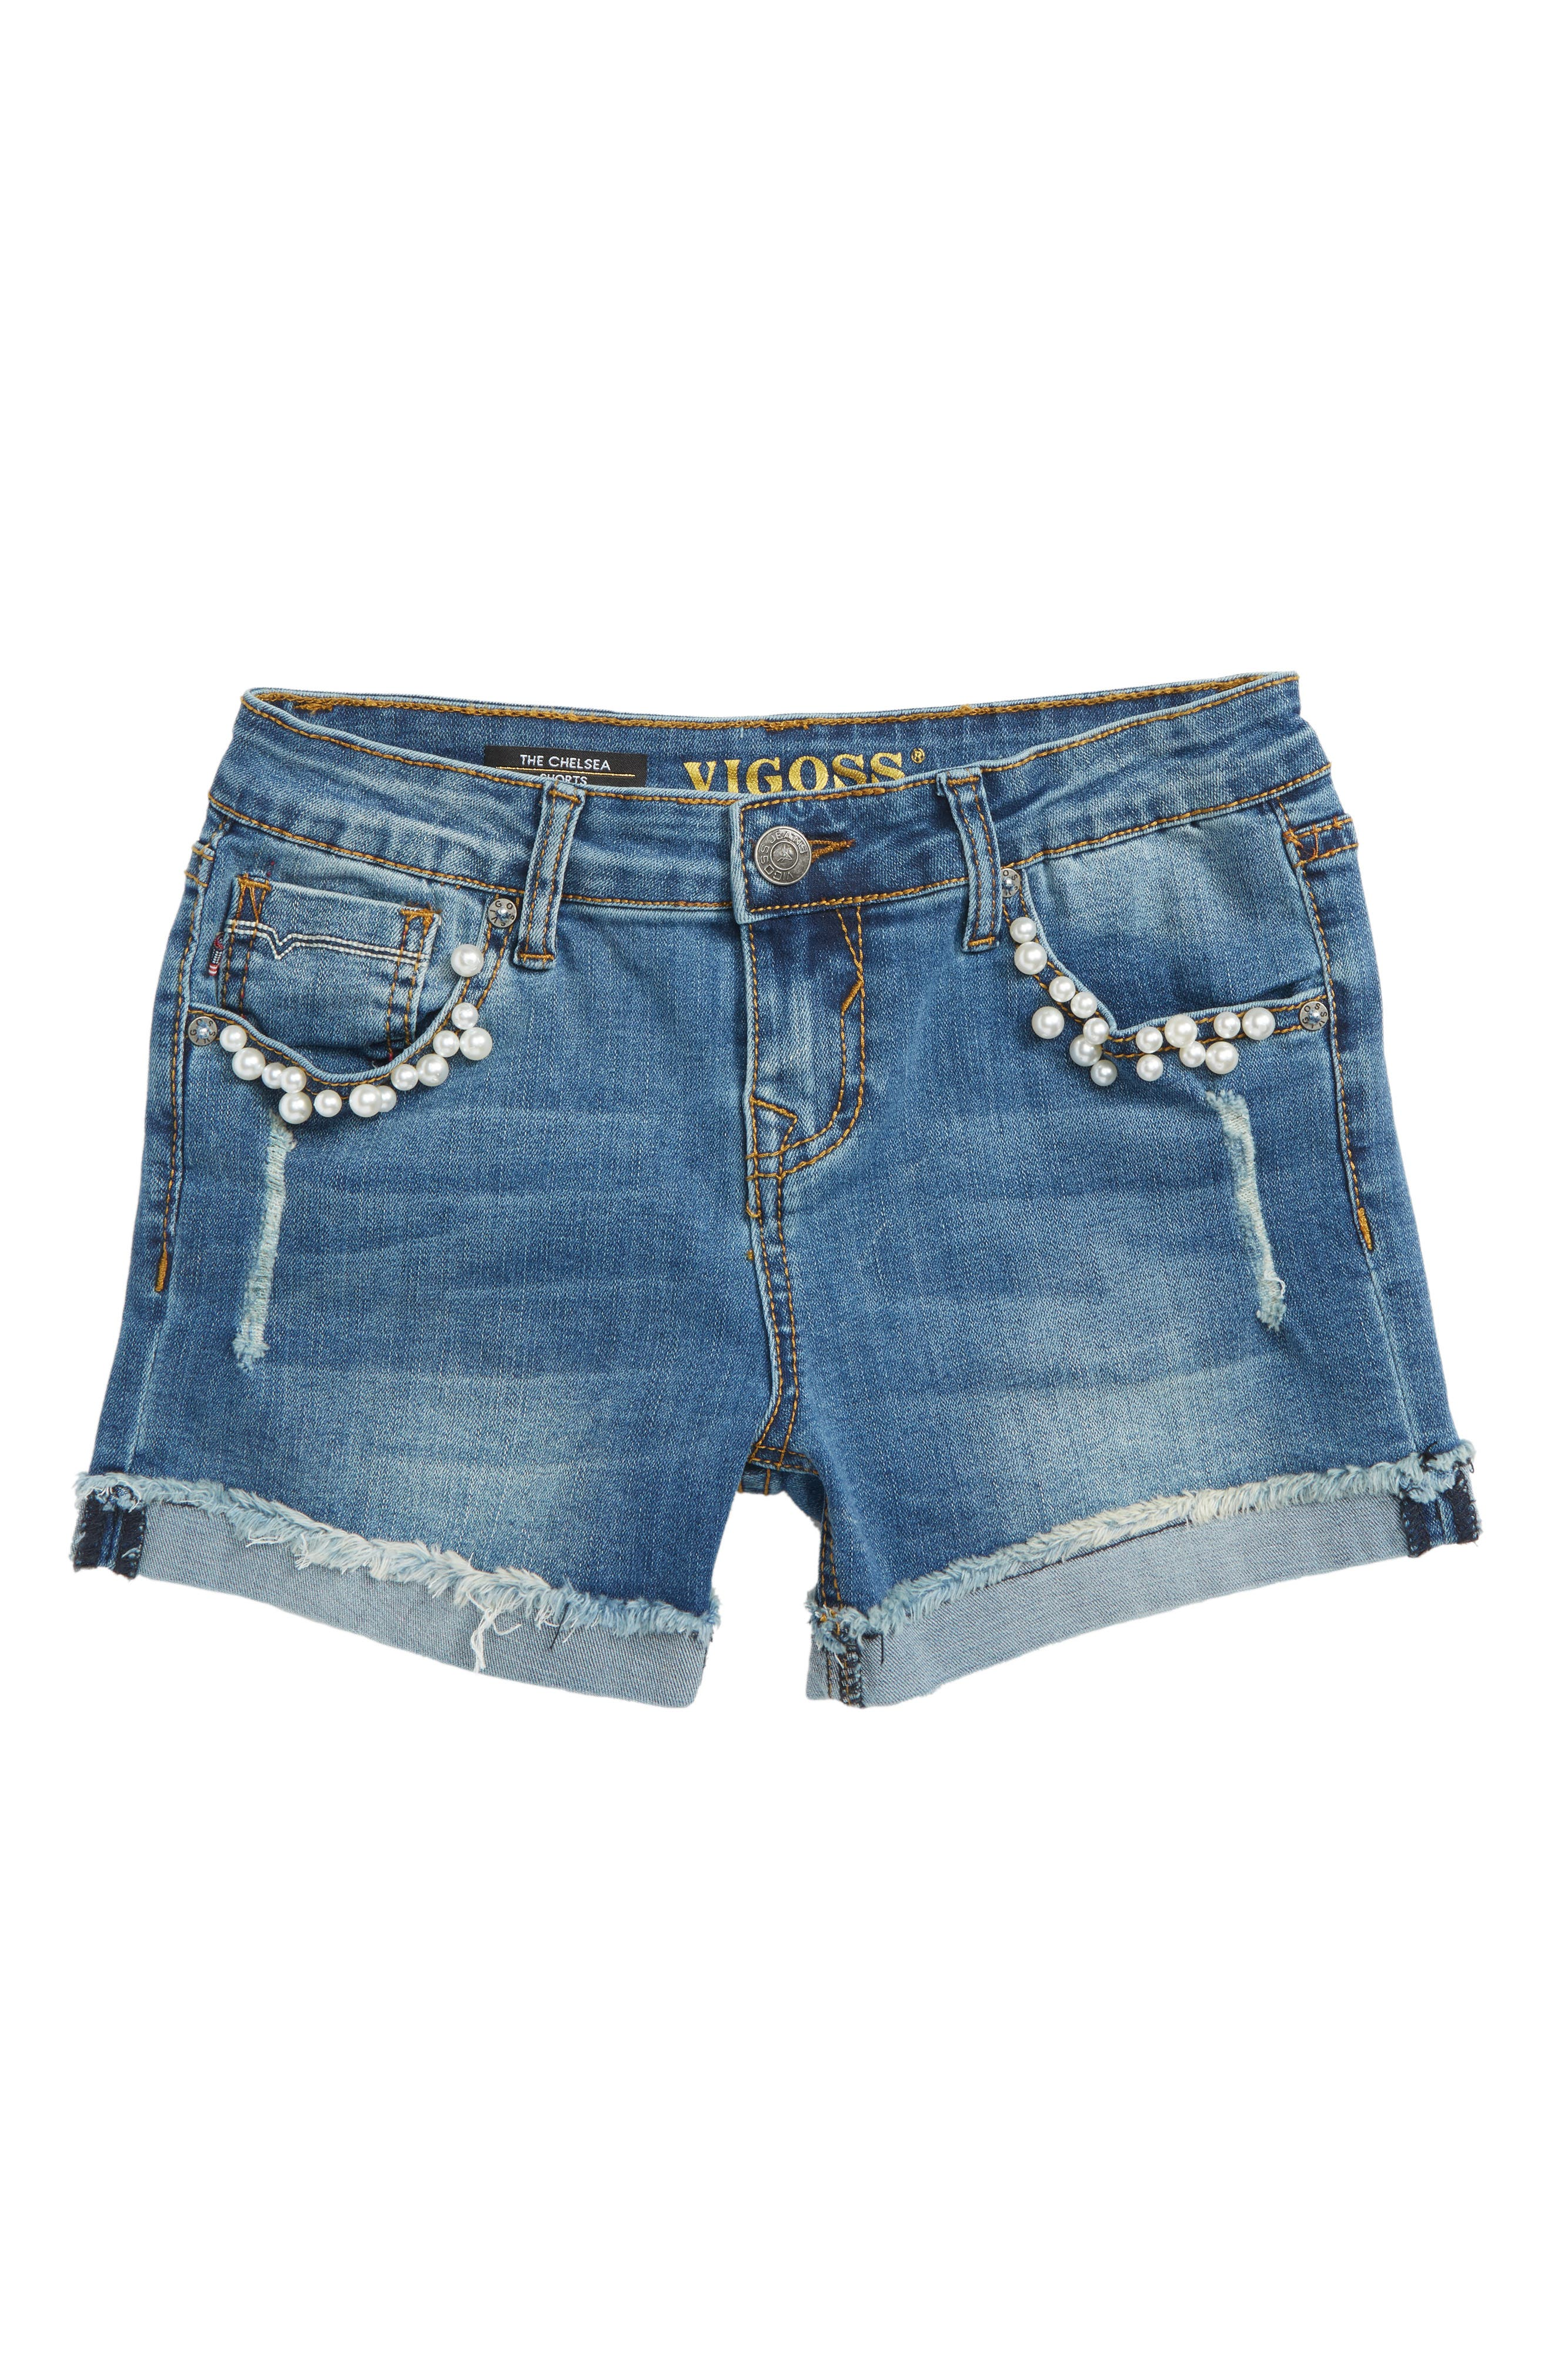 Alternate Image 1 Selected - Vigoss Imitation Pearl Frayed Denim Shorts (Big Girls)